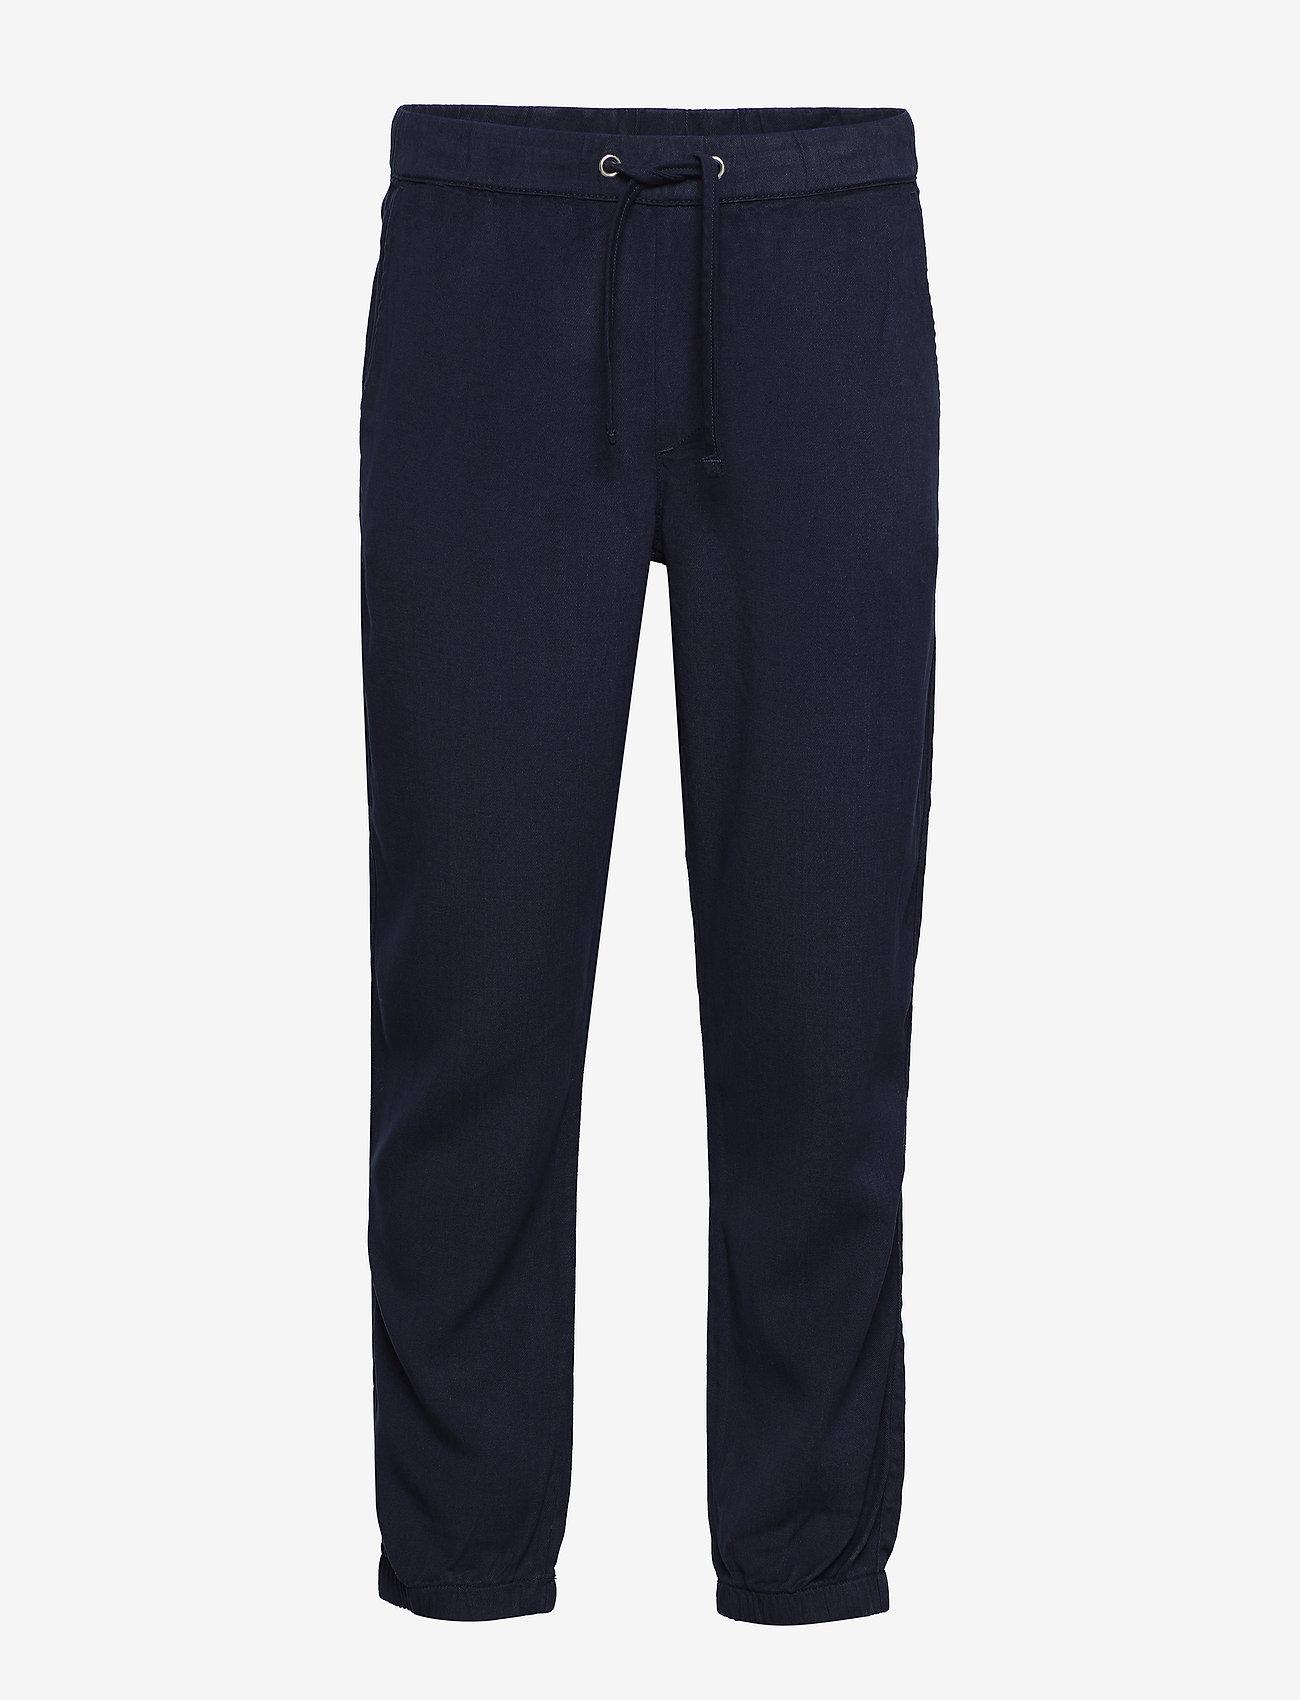 NN07 - Pelle 1363 - casual byxor - navy blue - 0